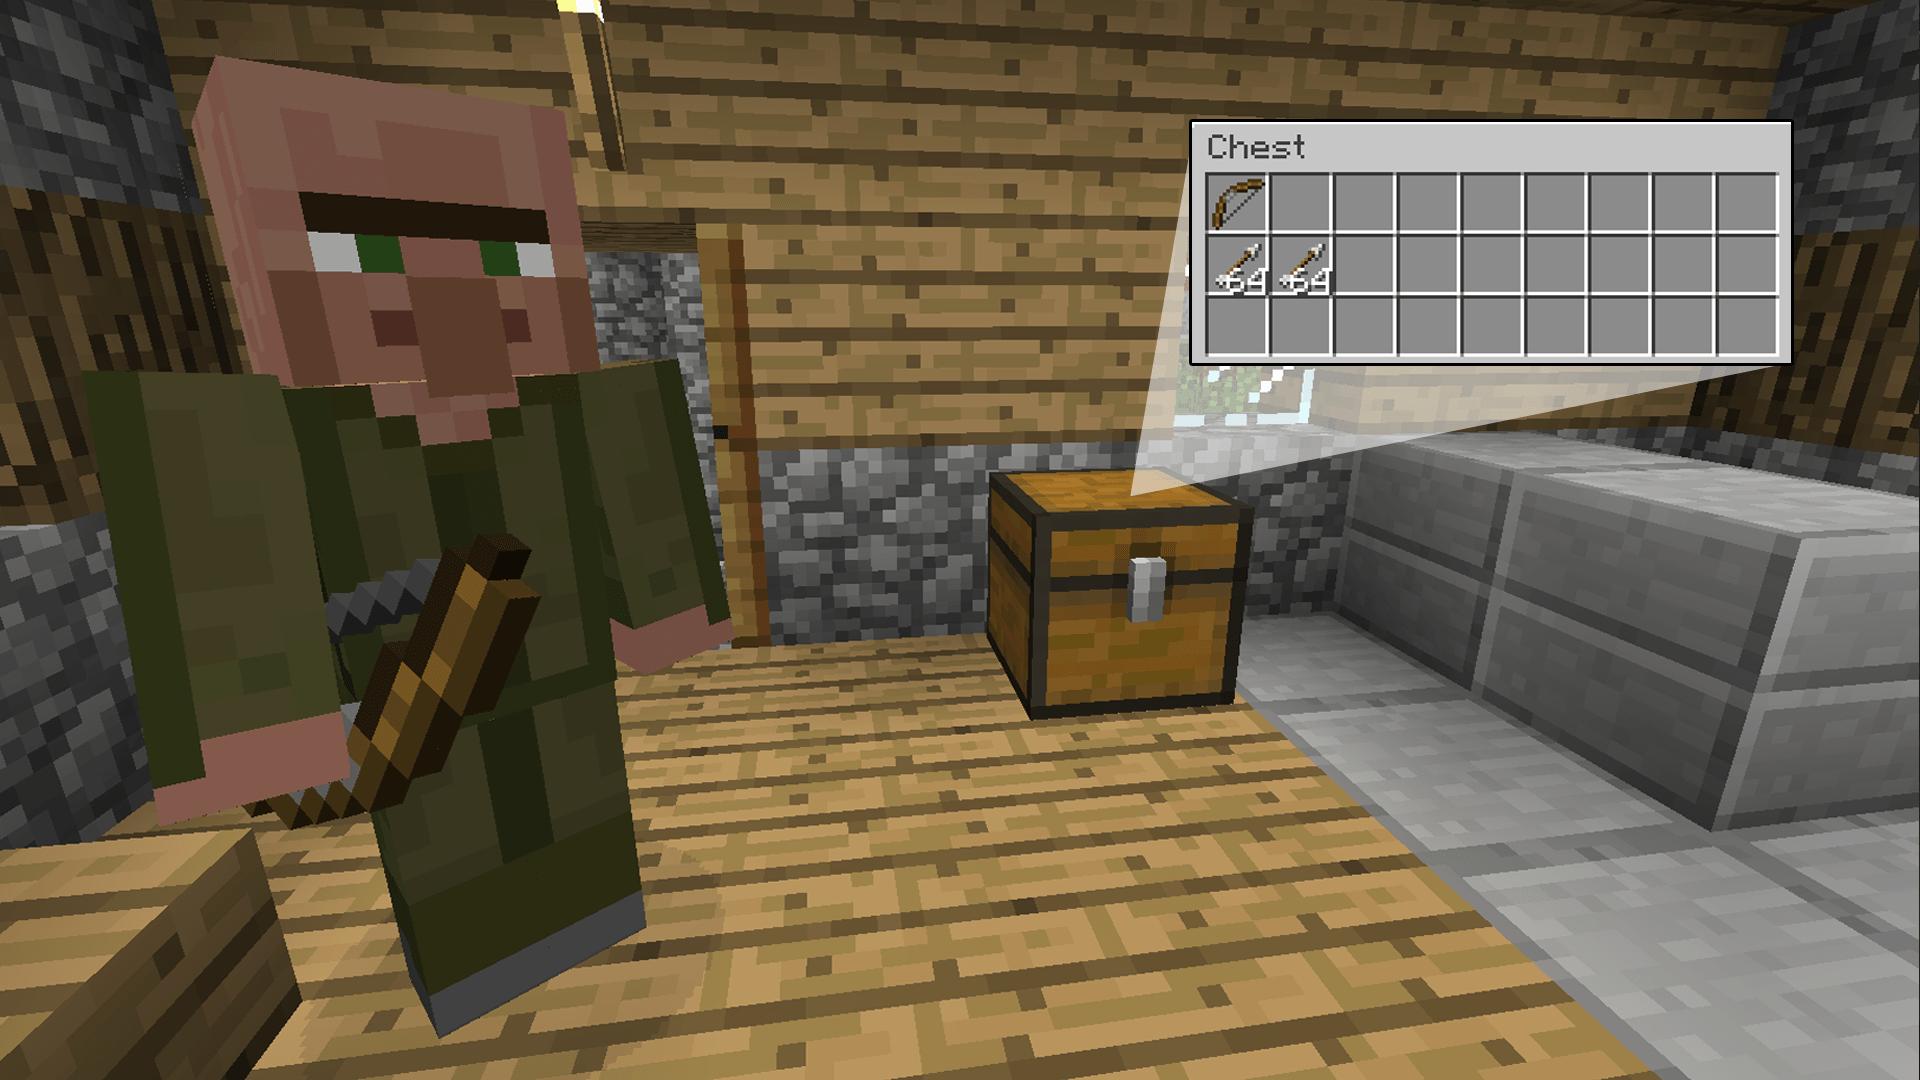 мод helpful villagers v1.3.1 cкачать для майнкрафт 1.7.10 #1